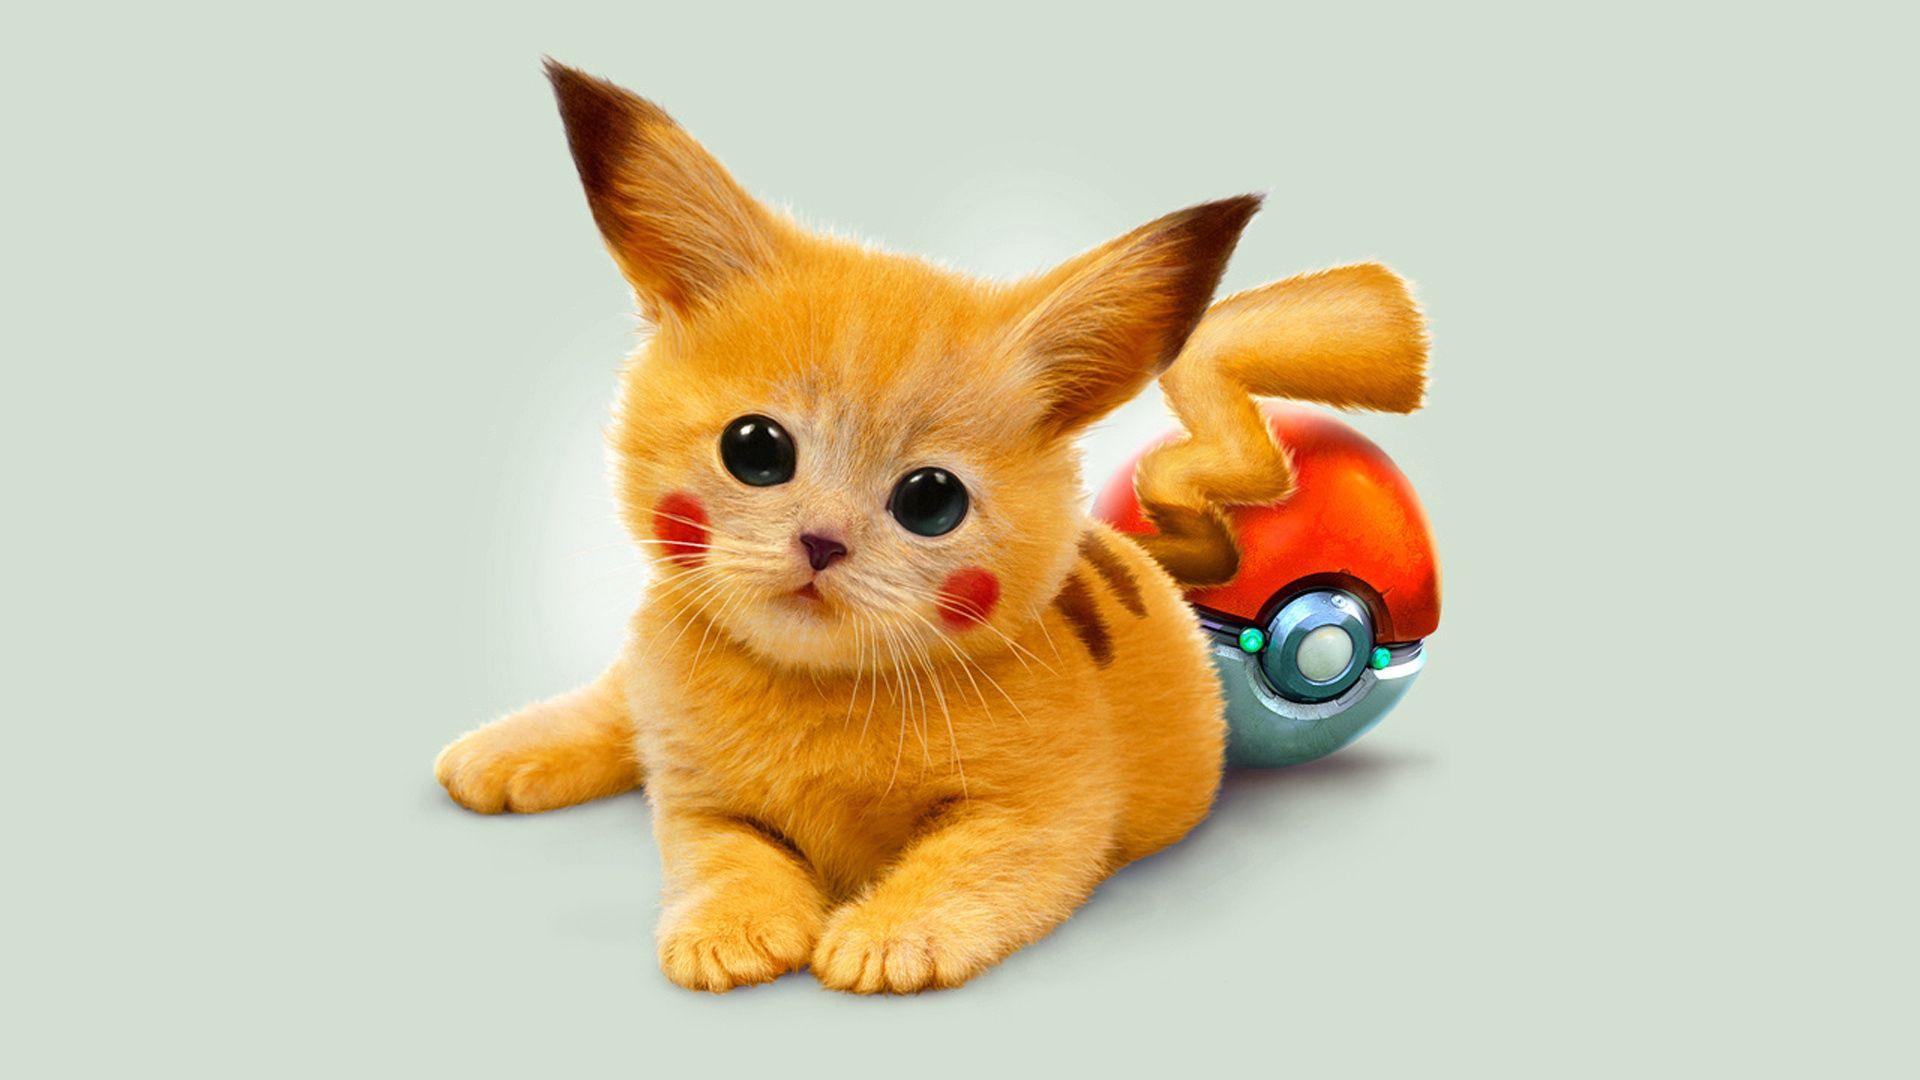 115419 download wallpaper Miscellanea, Miscellaneous, Art, Kitty, Kitten, Pokemon, Pokémon, Redhead, Eyes, Pikachu screensavers and pictures for free